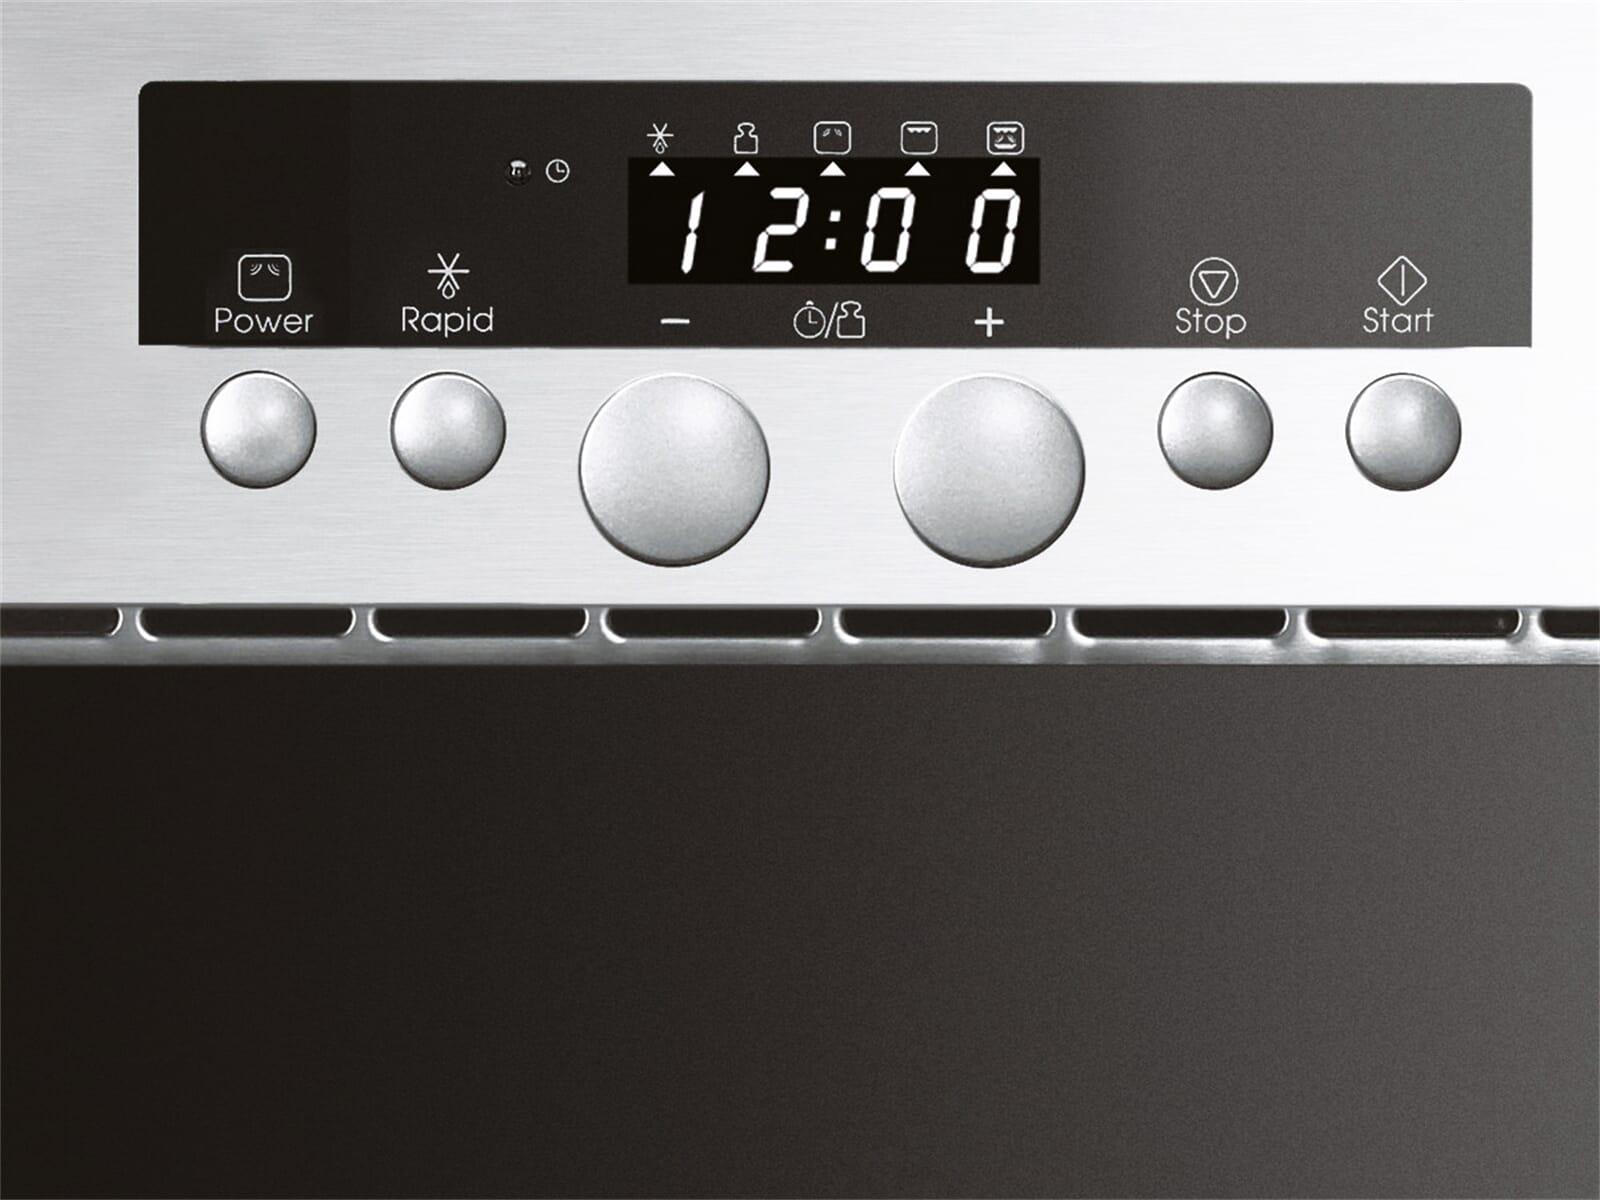 bauknecht 50cm emw 8538 in einbau mikrowelle edelstahl ebay. Black Bedroom Furniture Sets. Home Design Ideas